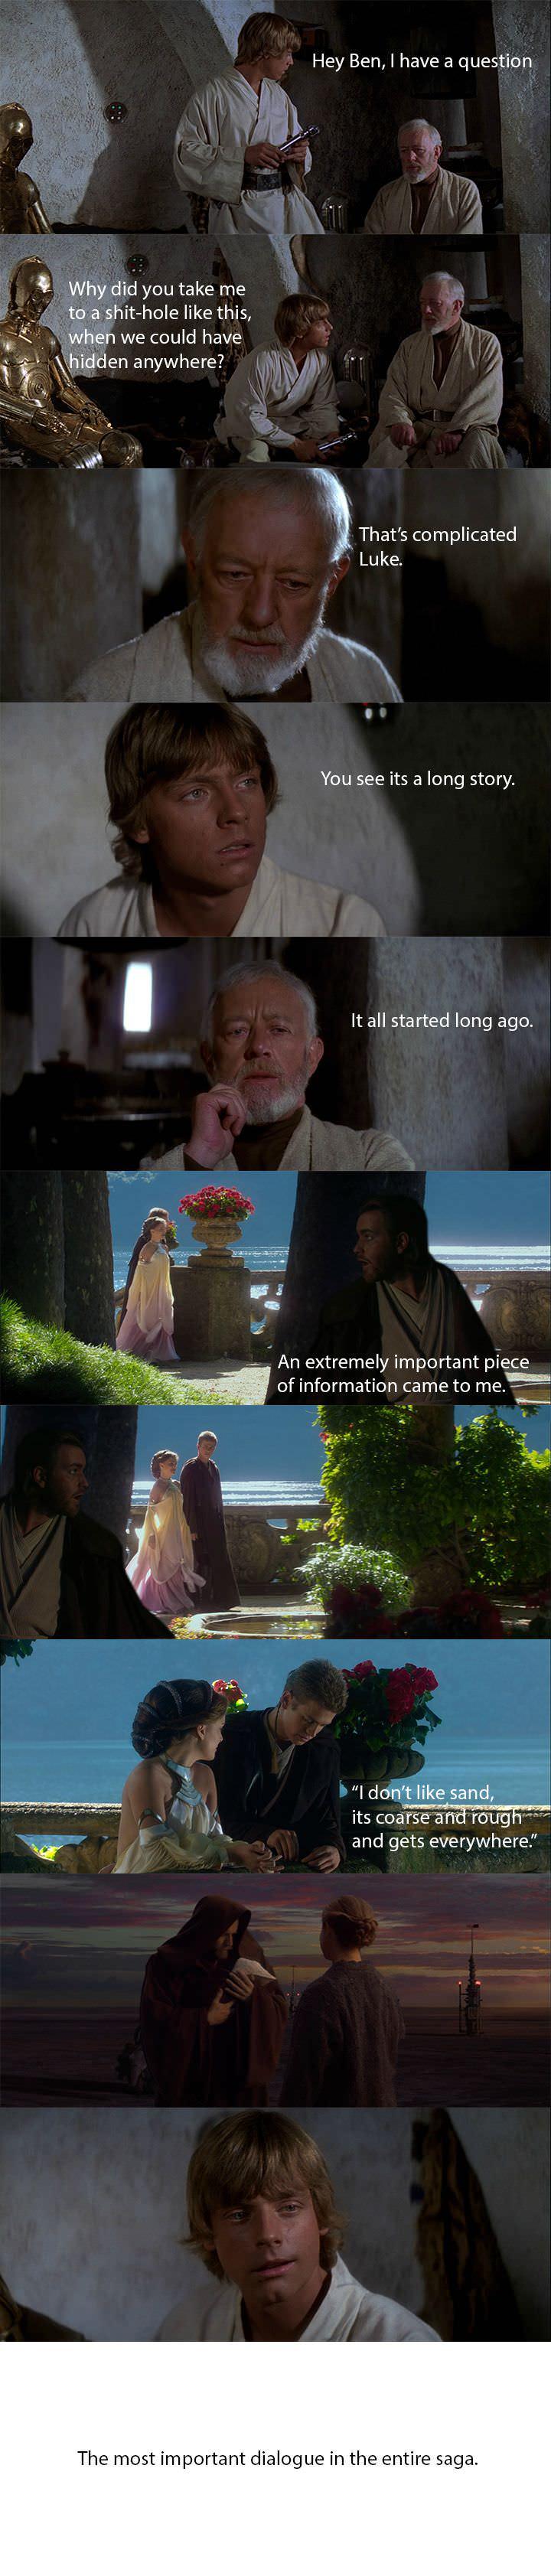 Why Obi-Wan Took Luke To Tatooine